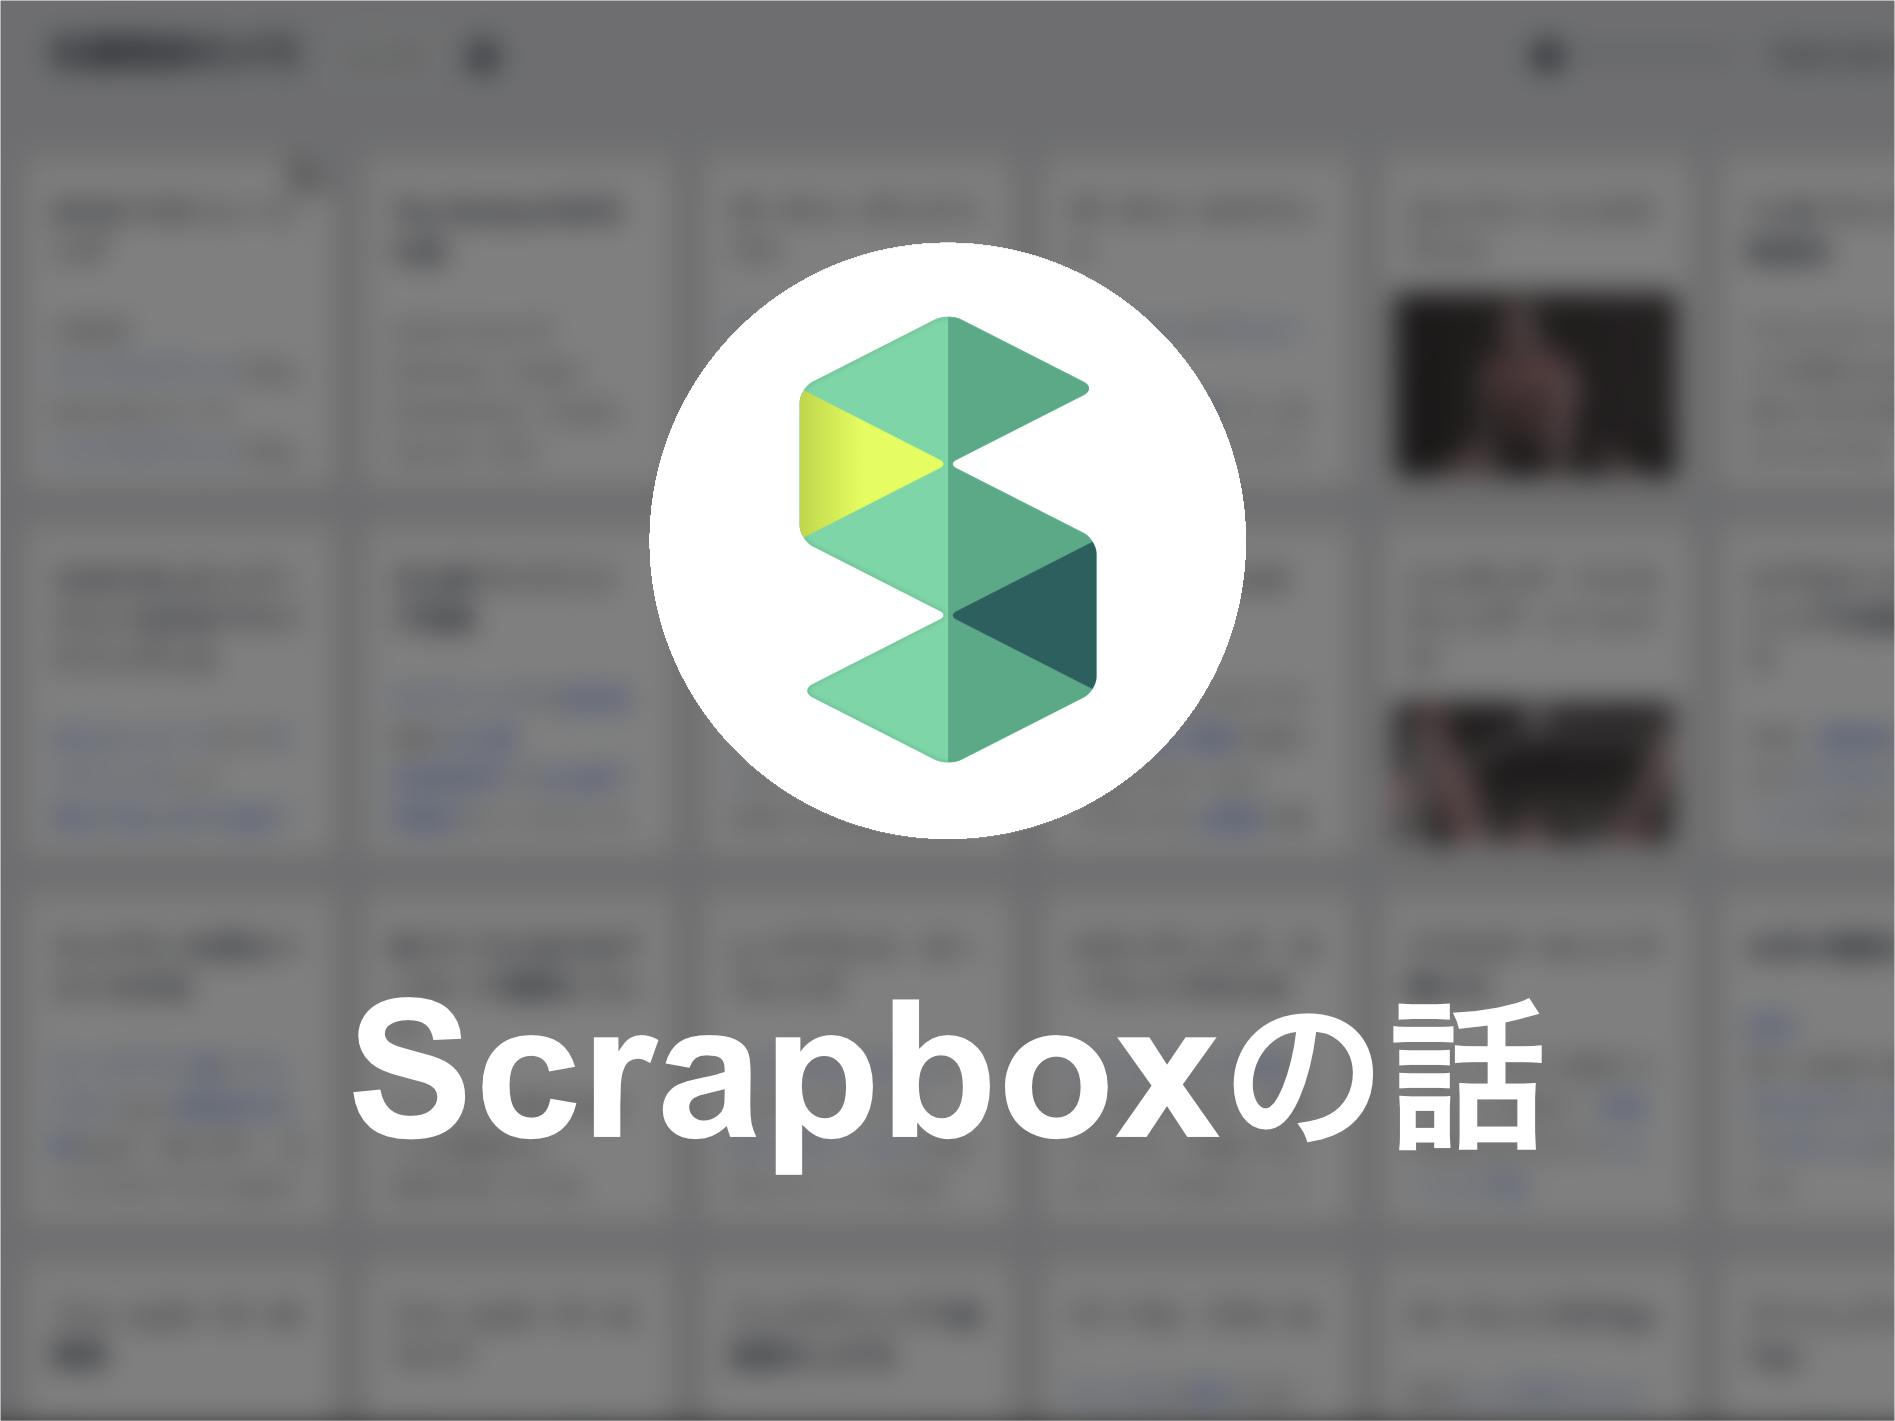 Scrapboxでトレーニングが捗る話と保存してるもの